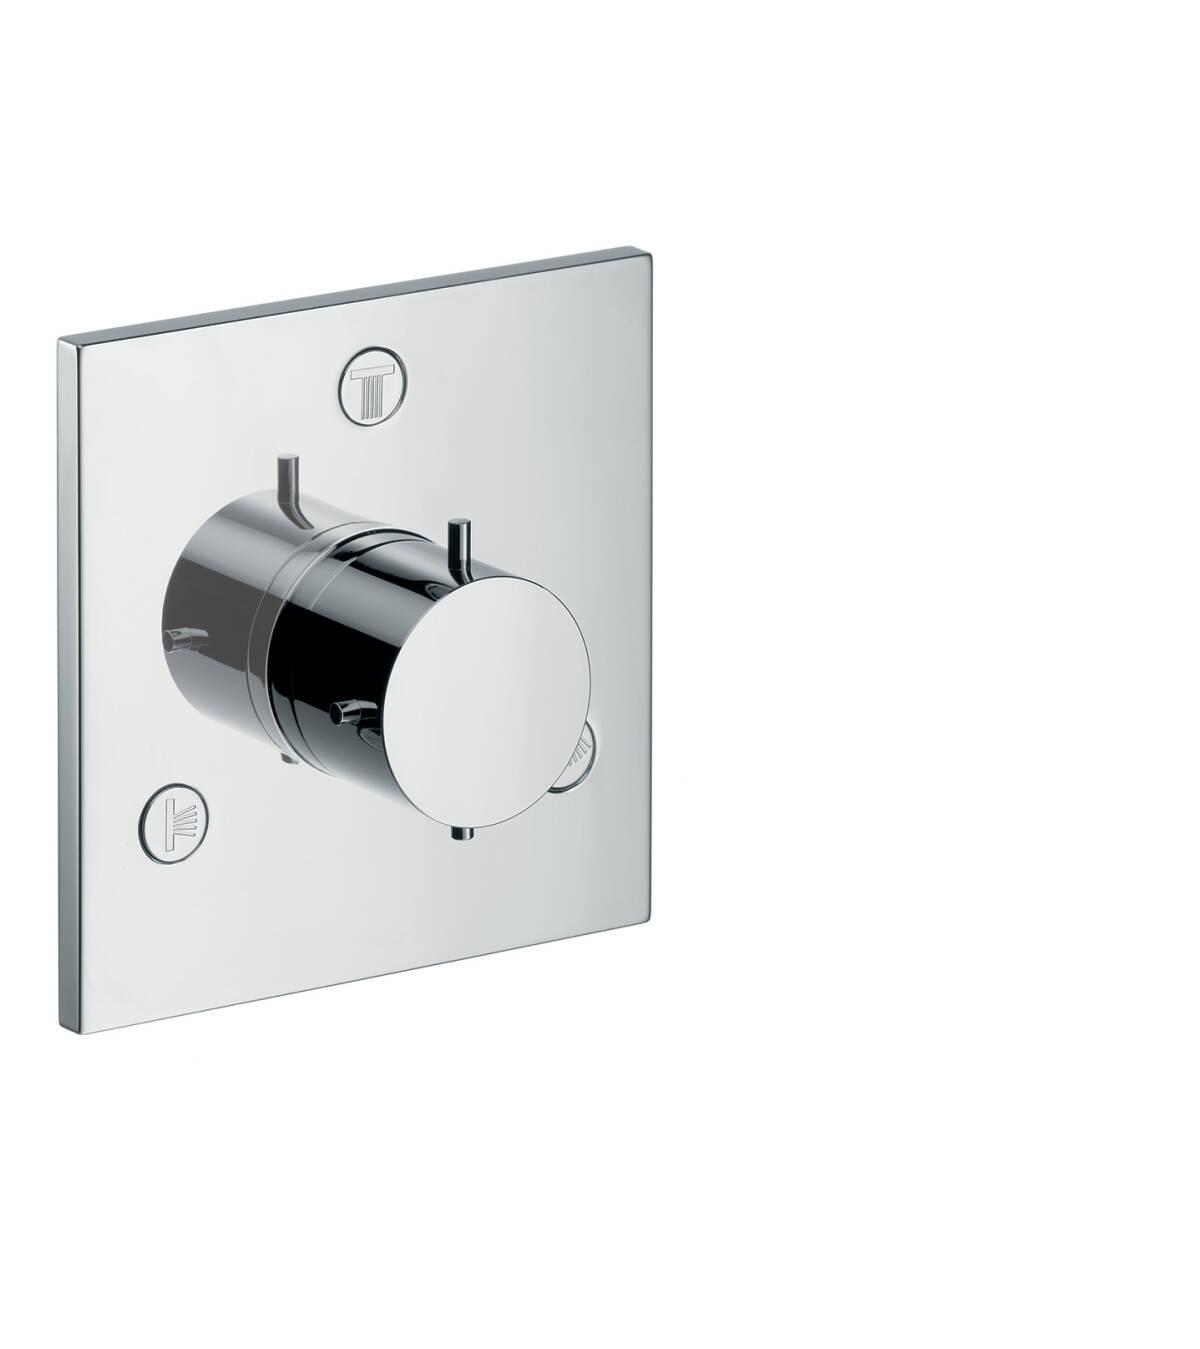 Shut-off/ diverter valve Trio/ Quattro for concealed installation, Brushed Chrome, 10934260